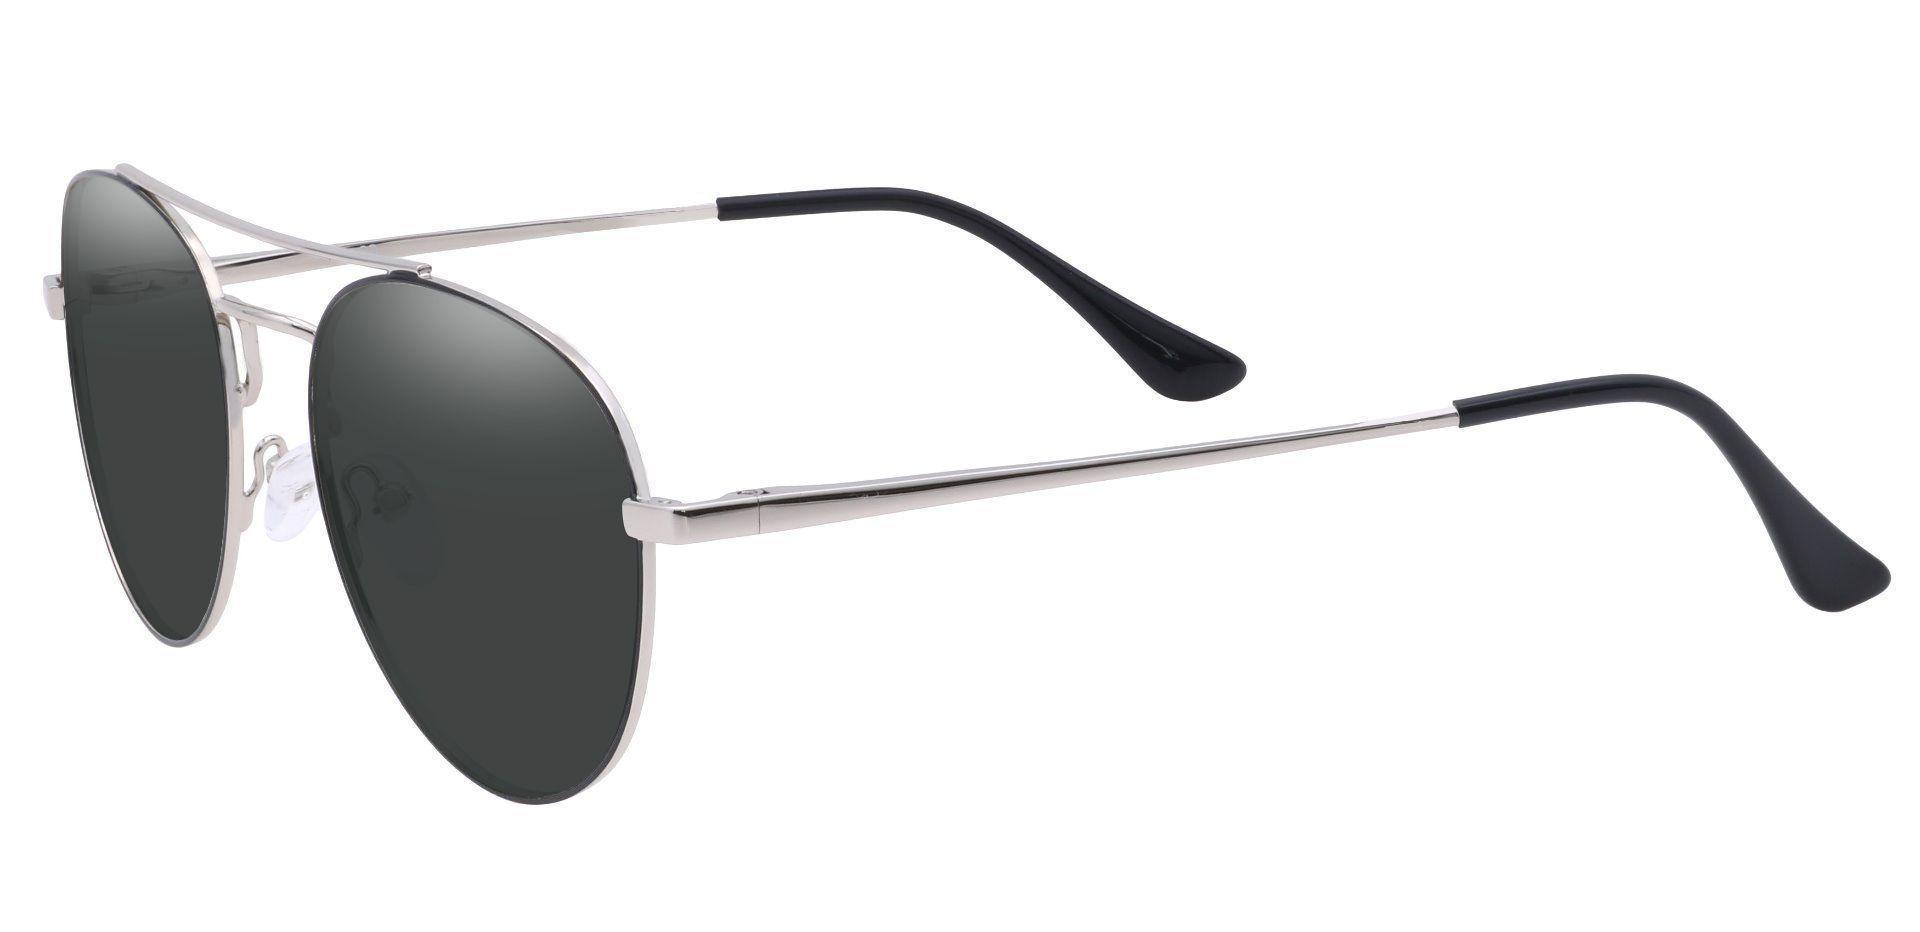 Trapp Aviator Progressive Sunglasses - Gray Frame With Gray Lenses